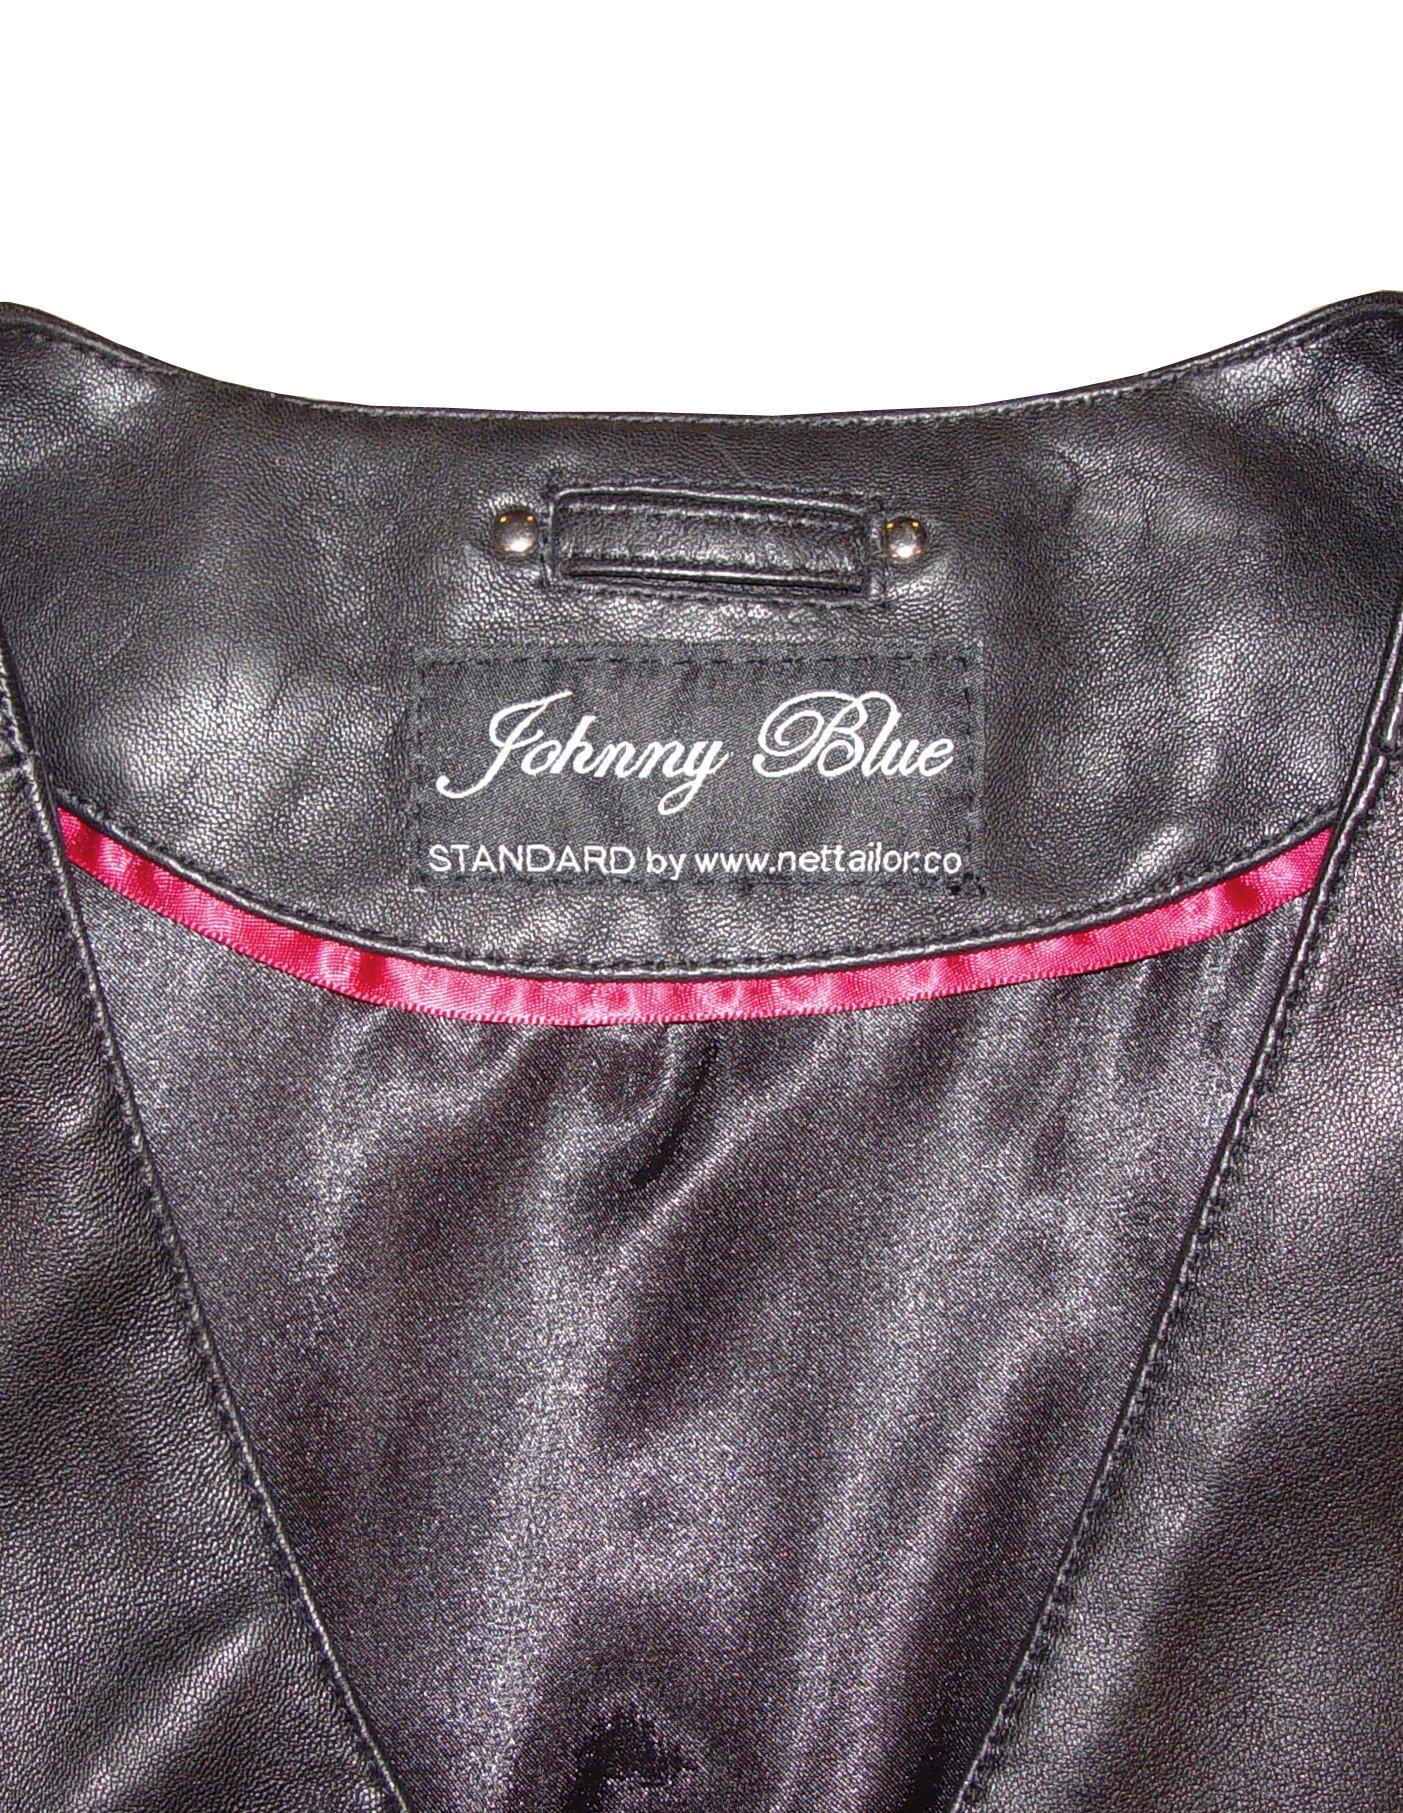 Johnnyblue 4 Season Wear Womens 5006 PETITE & ALL SIZELambskin Leather Trench Coat by Johnnyblue (Image #6)